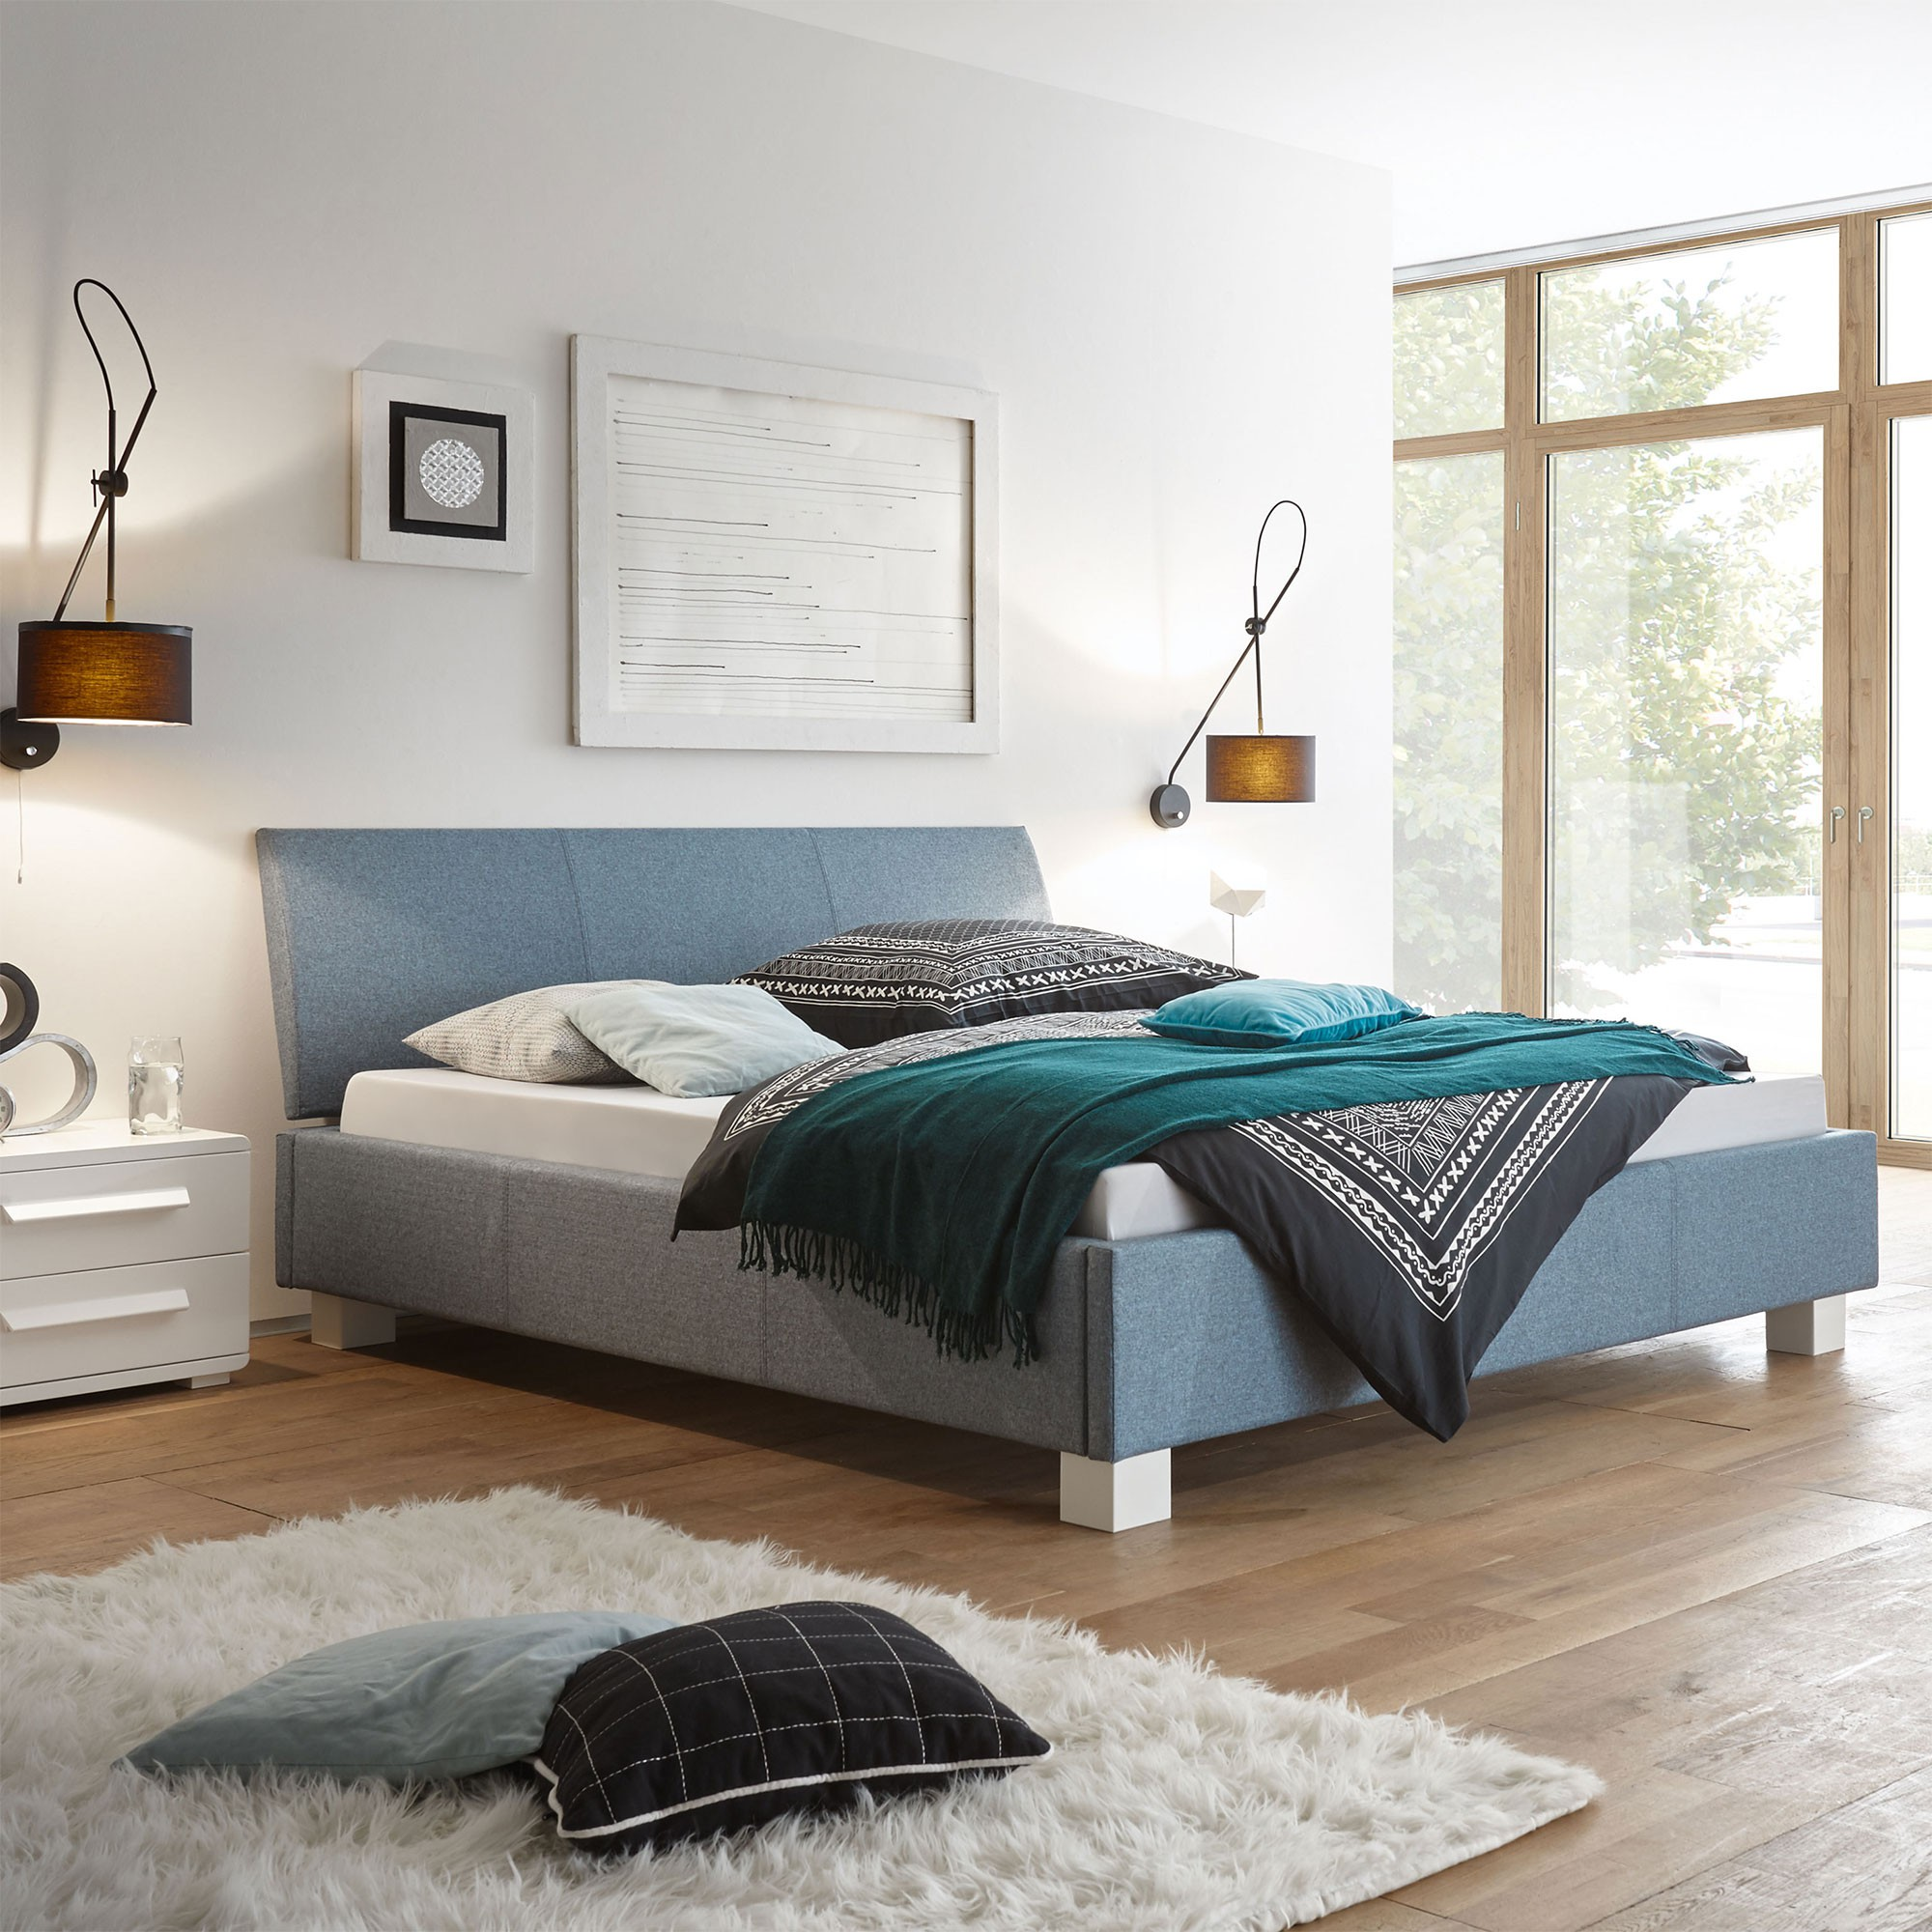 Full Size of Polsterbett 200x220 Hasena Dream Line Aprino Ivio Ripo Online Kaufen Belama Betten Bett Wohnzimmer Polsterbett 200x220